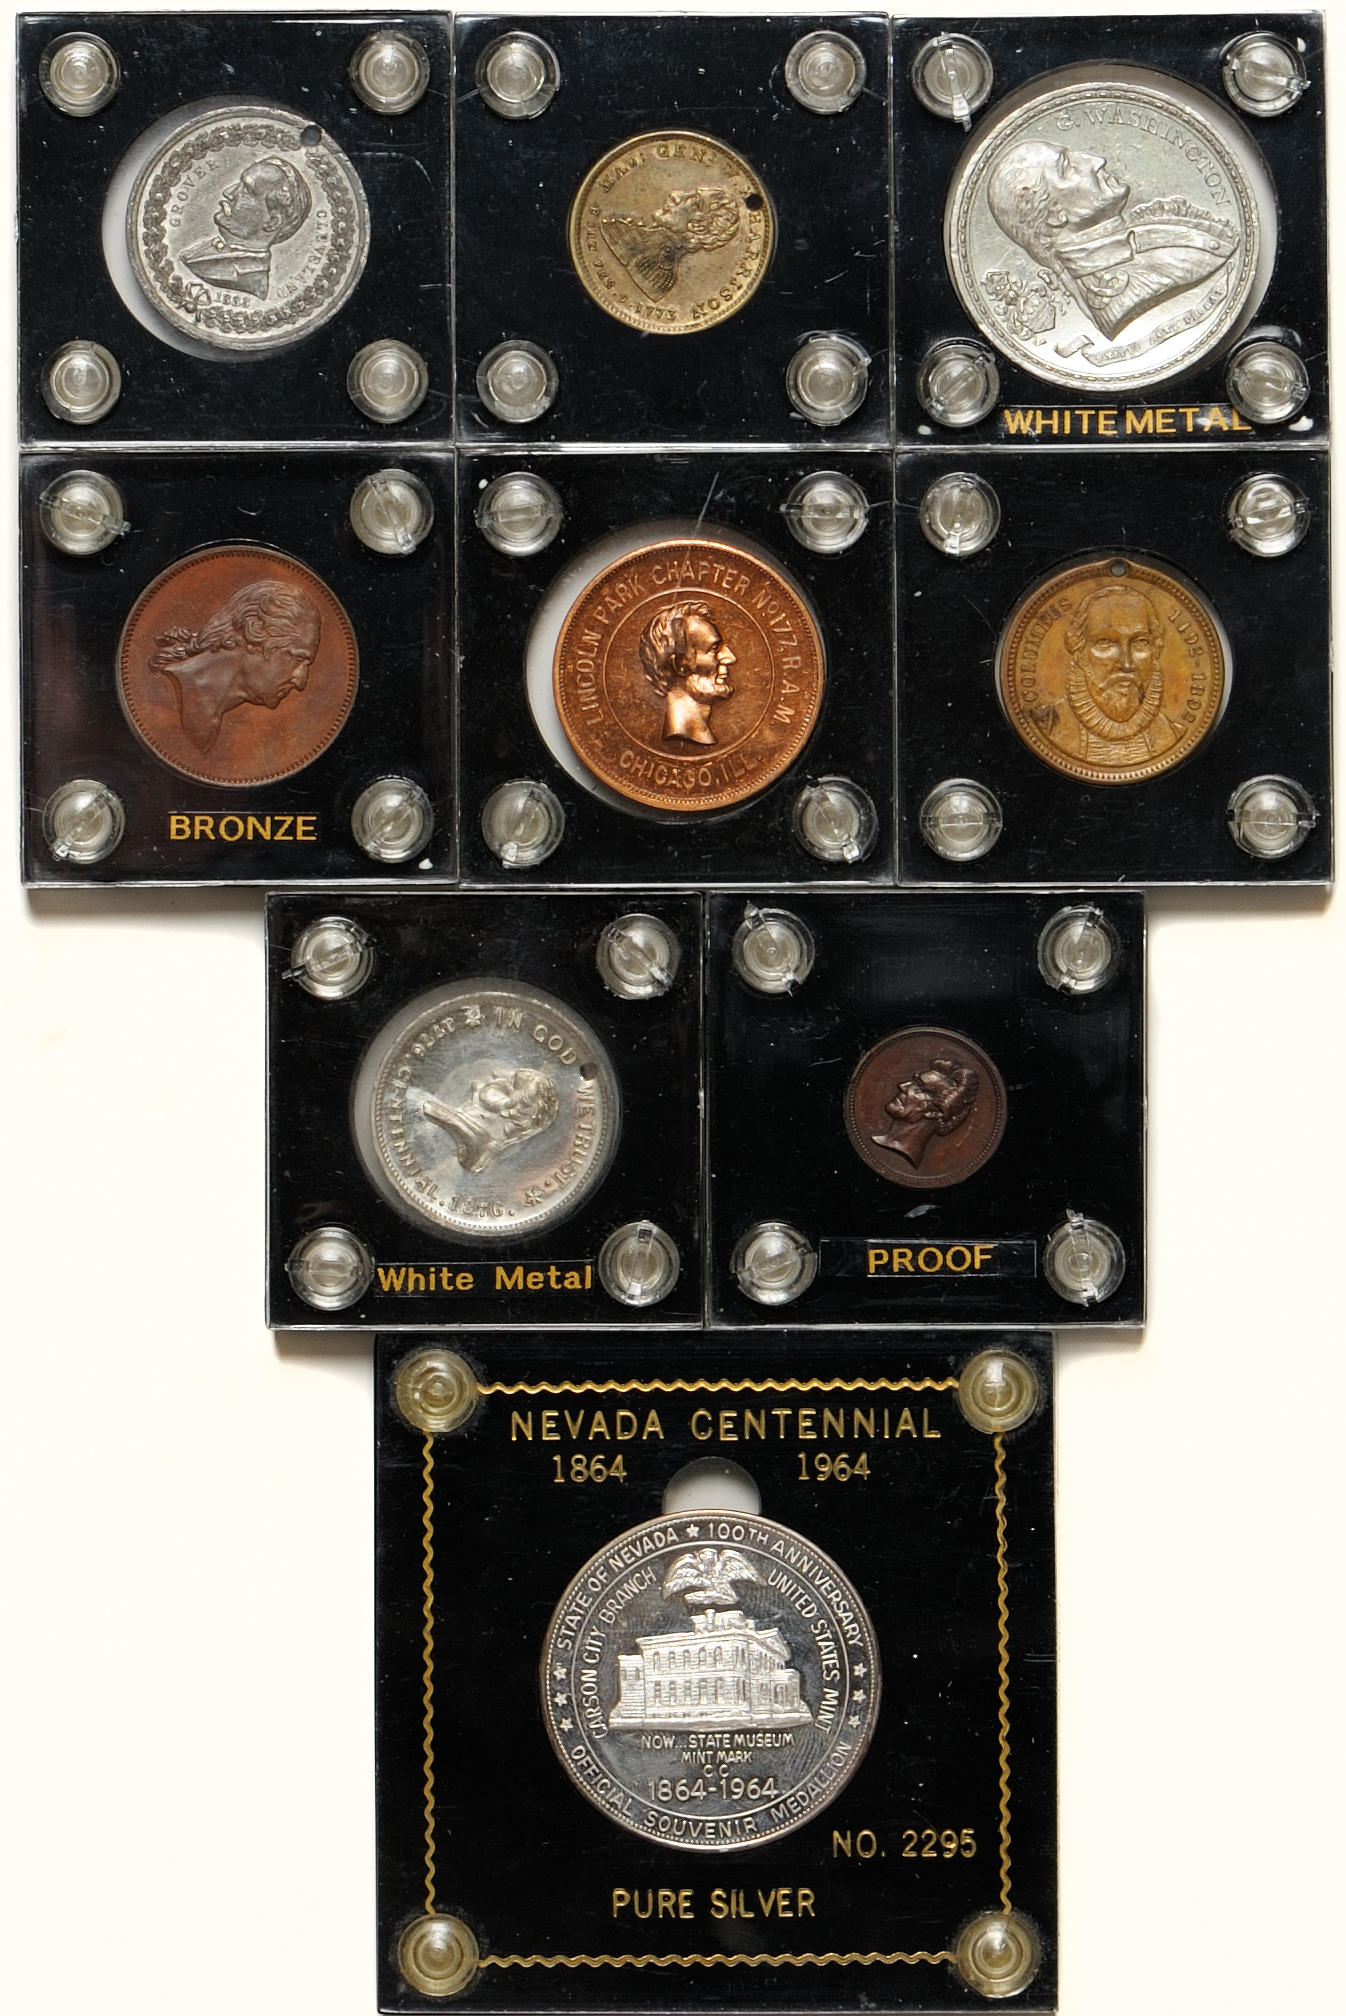 1964 Nevada State Centennial Medal White Metal # Medals Exonumia